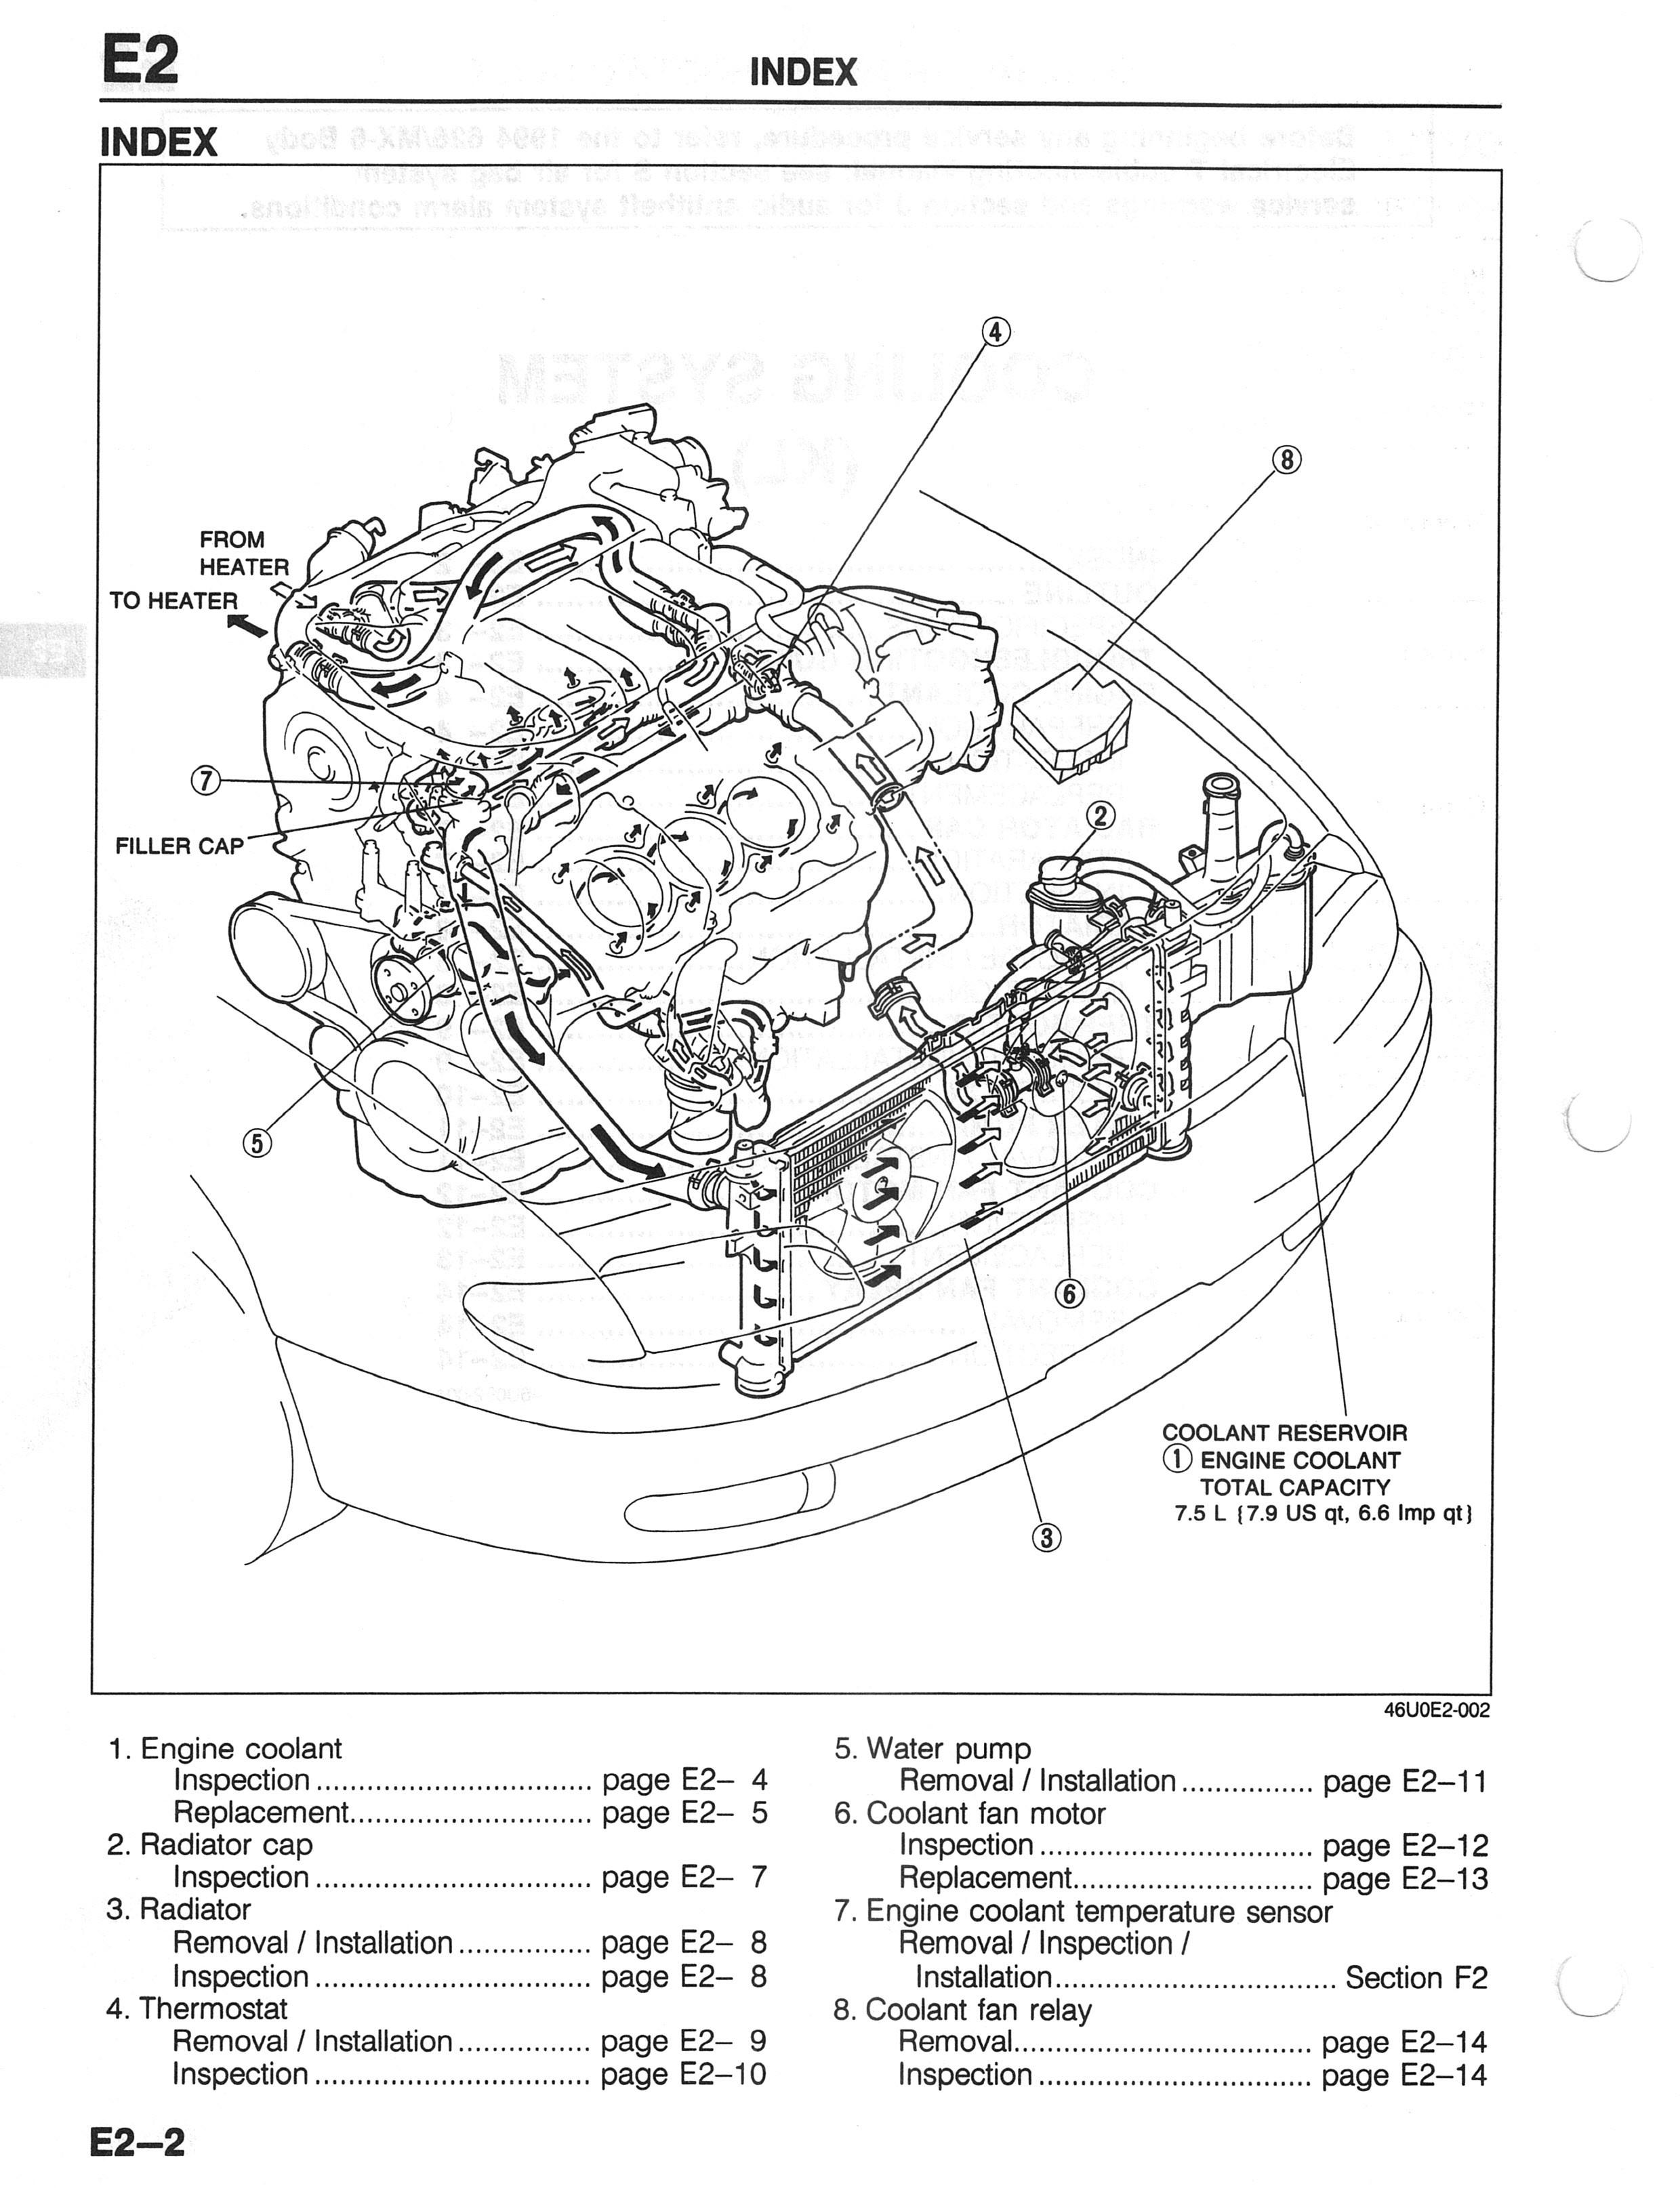 2003 Mazda 6 Keyless Wiring Diagrams. 2008 mazda 3 bose